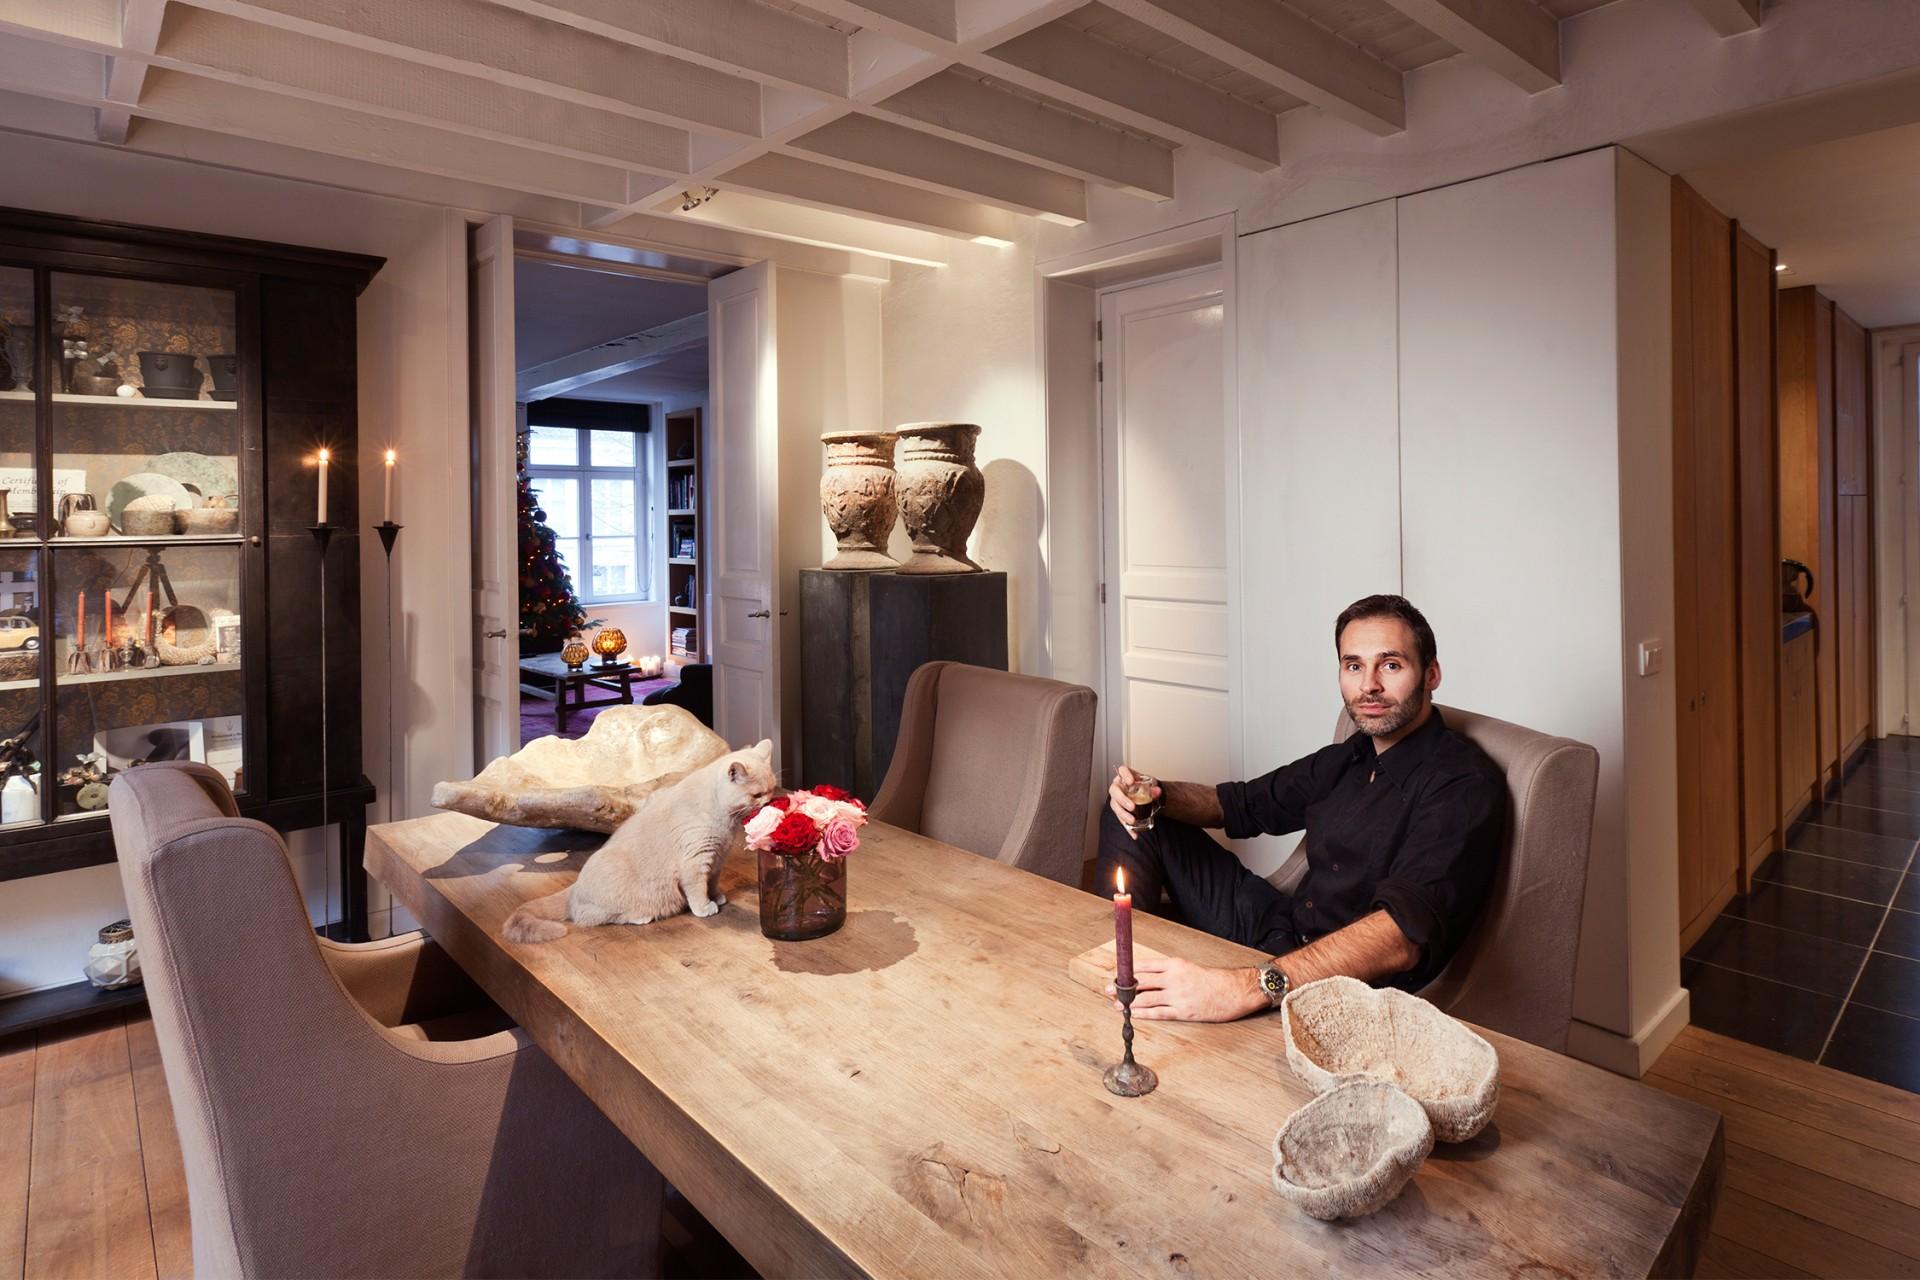 AVANTGAND - Zoob: Frederik Van Pamel <br/> florist, decorator